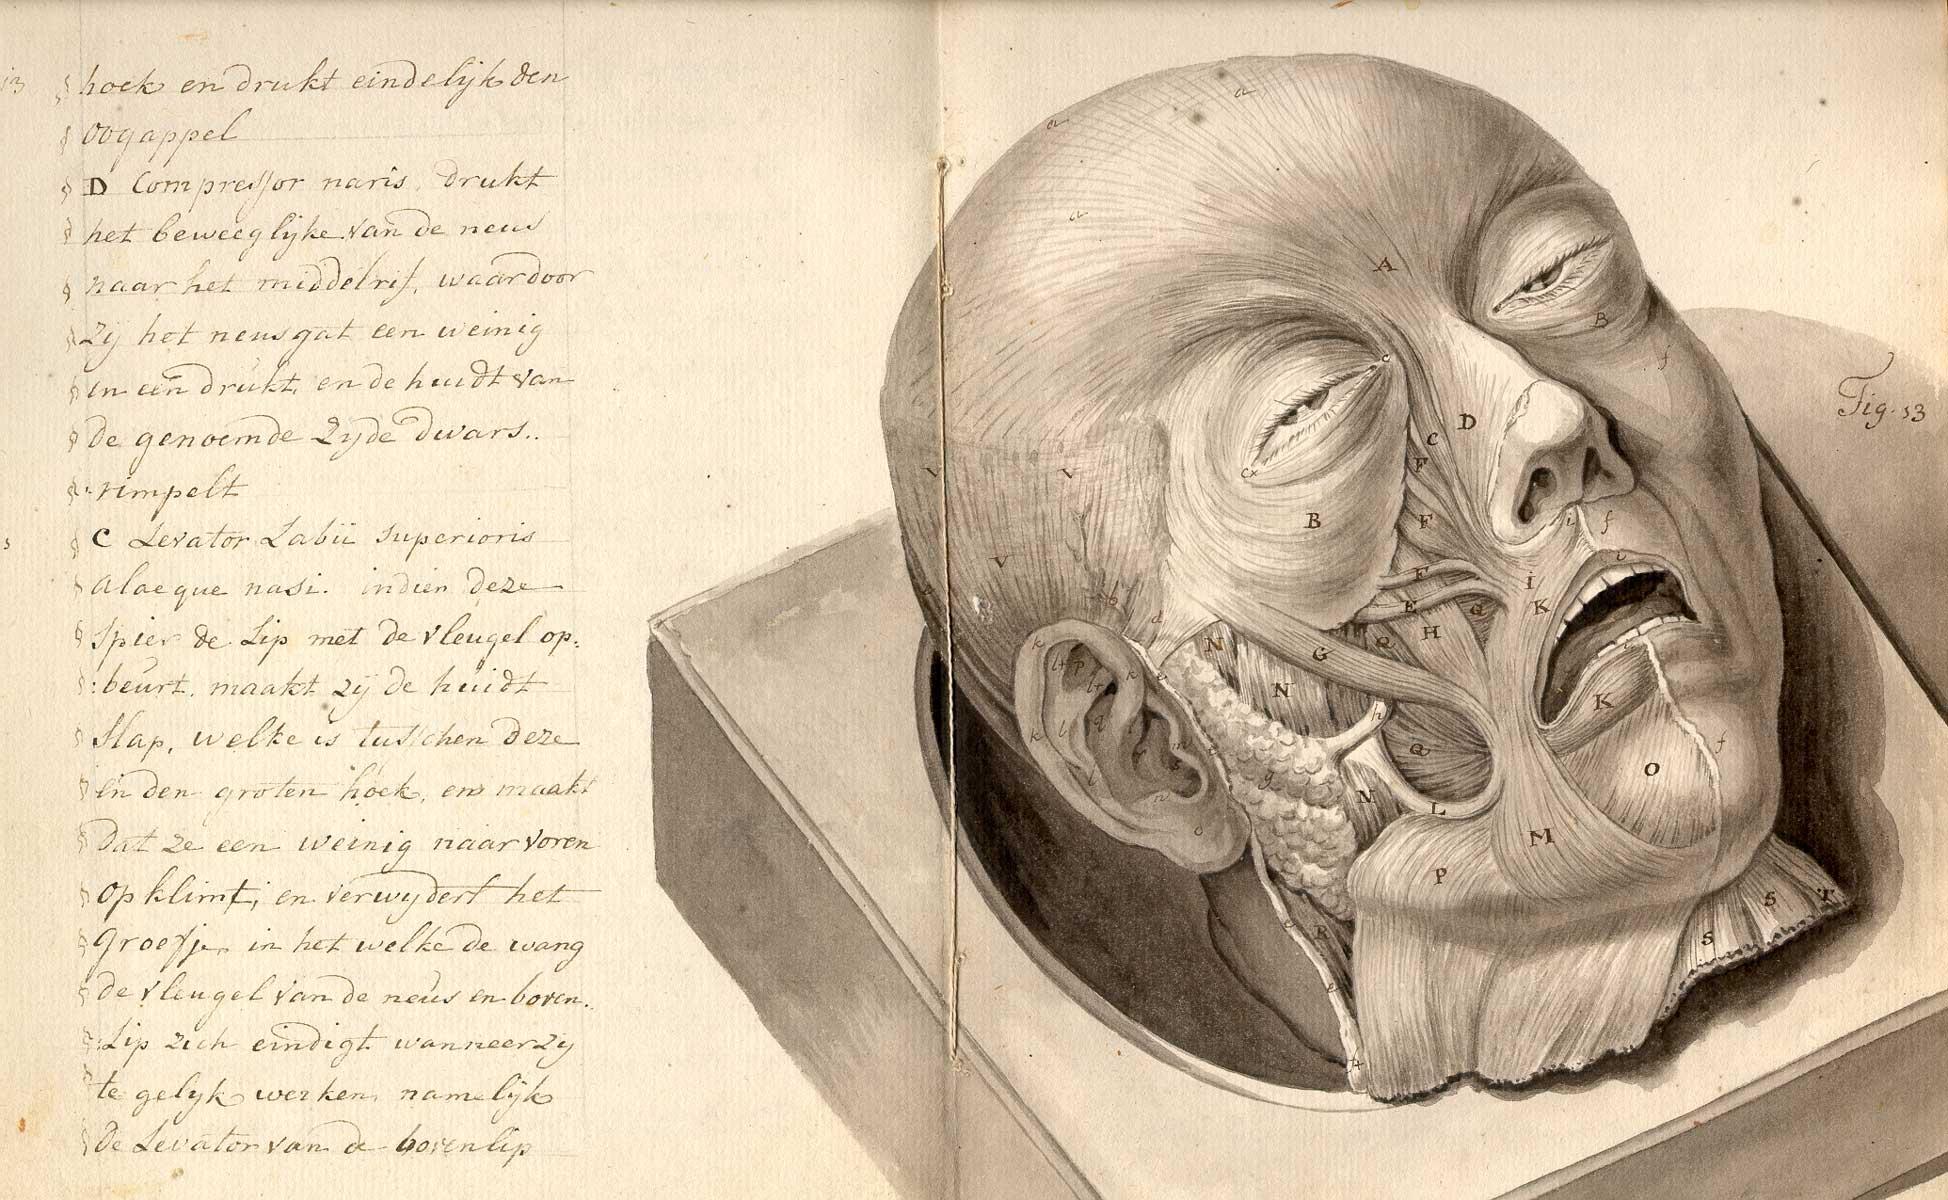 IN CASE OF DEATH - Fitzcarraldo Editions